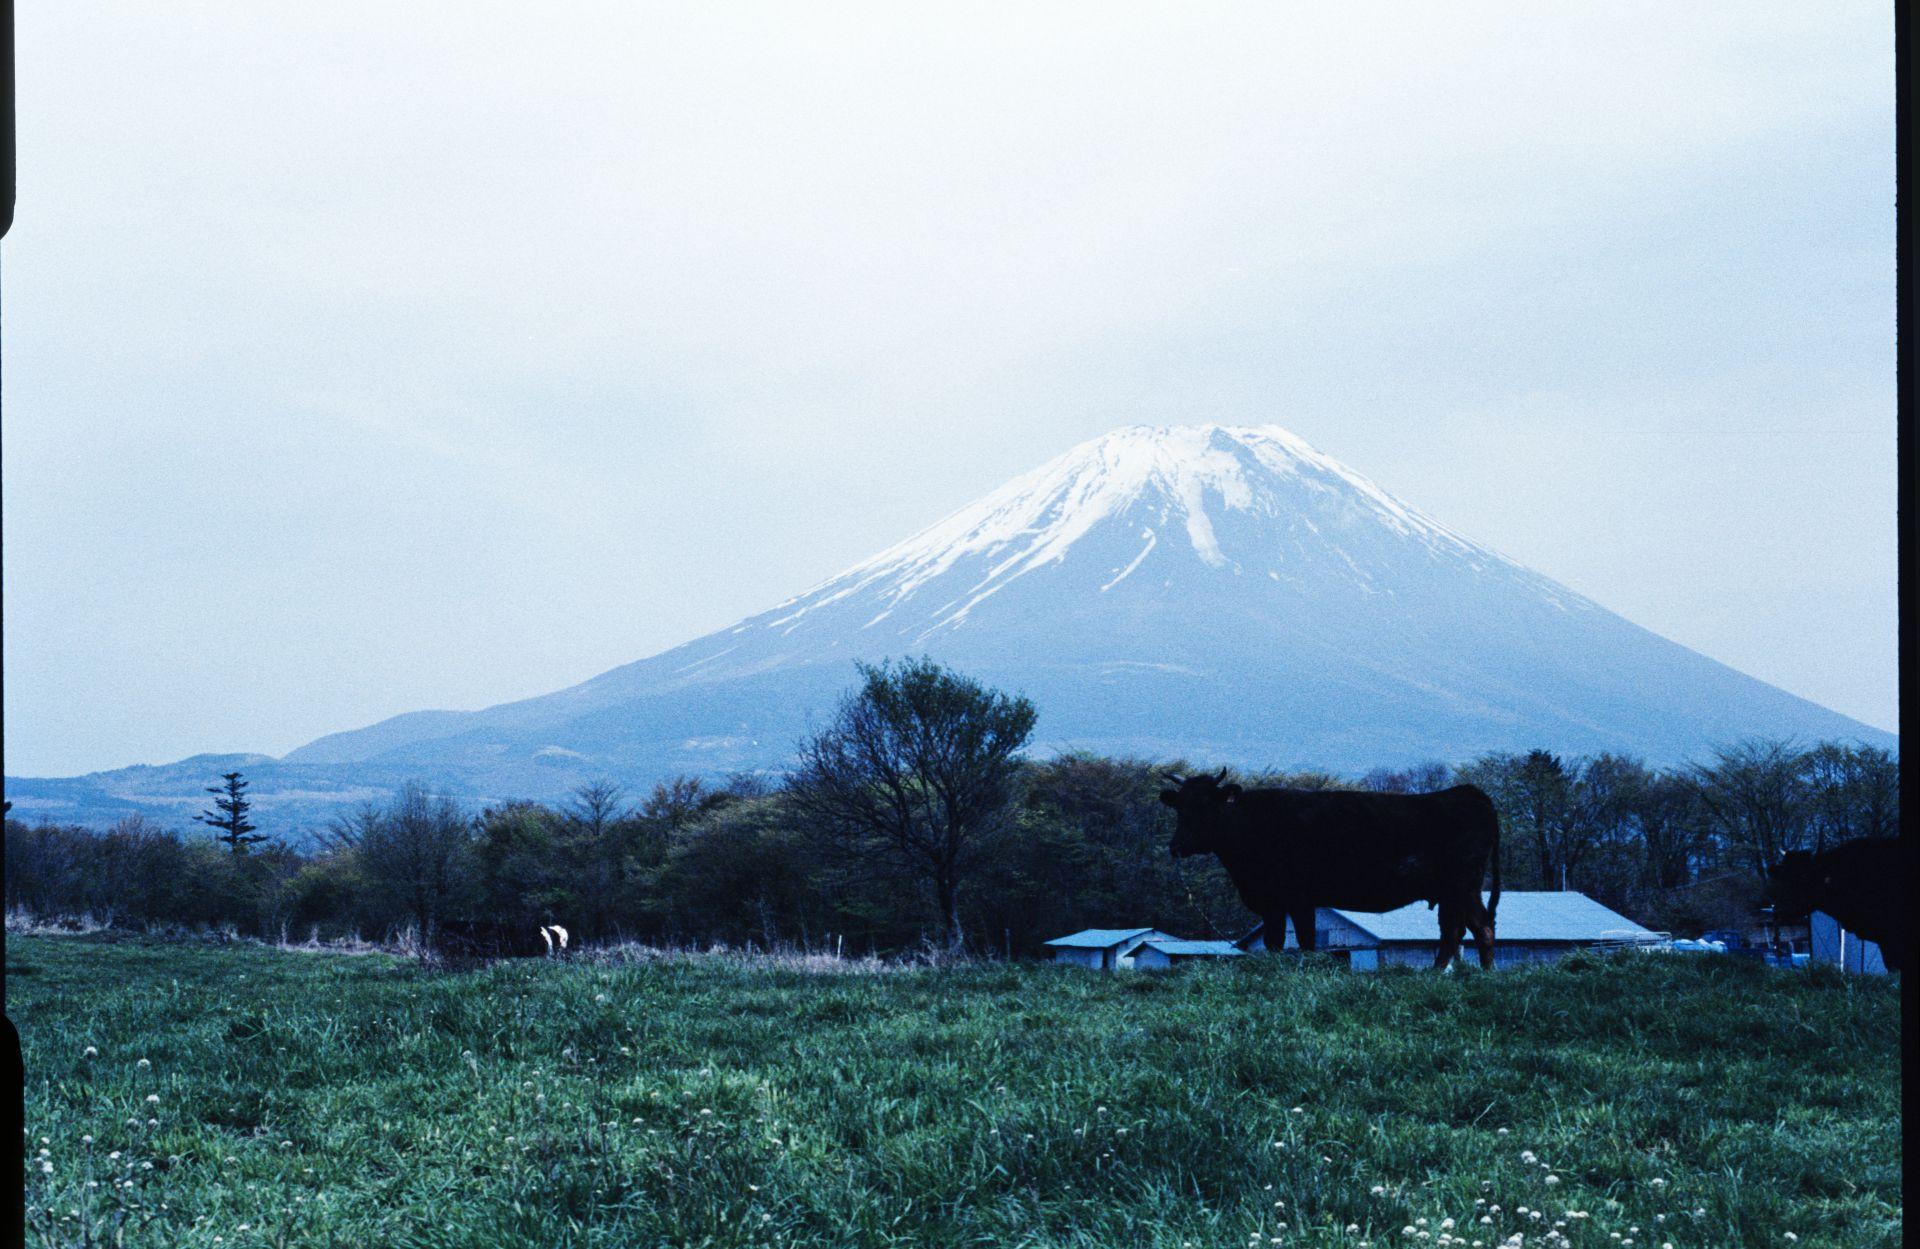 f:id:yasuo_ssi:20201016003417j:plain